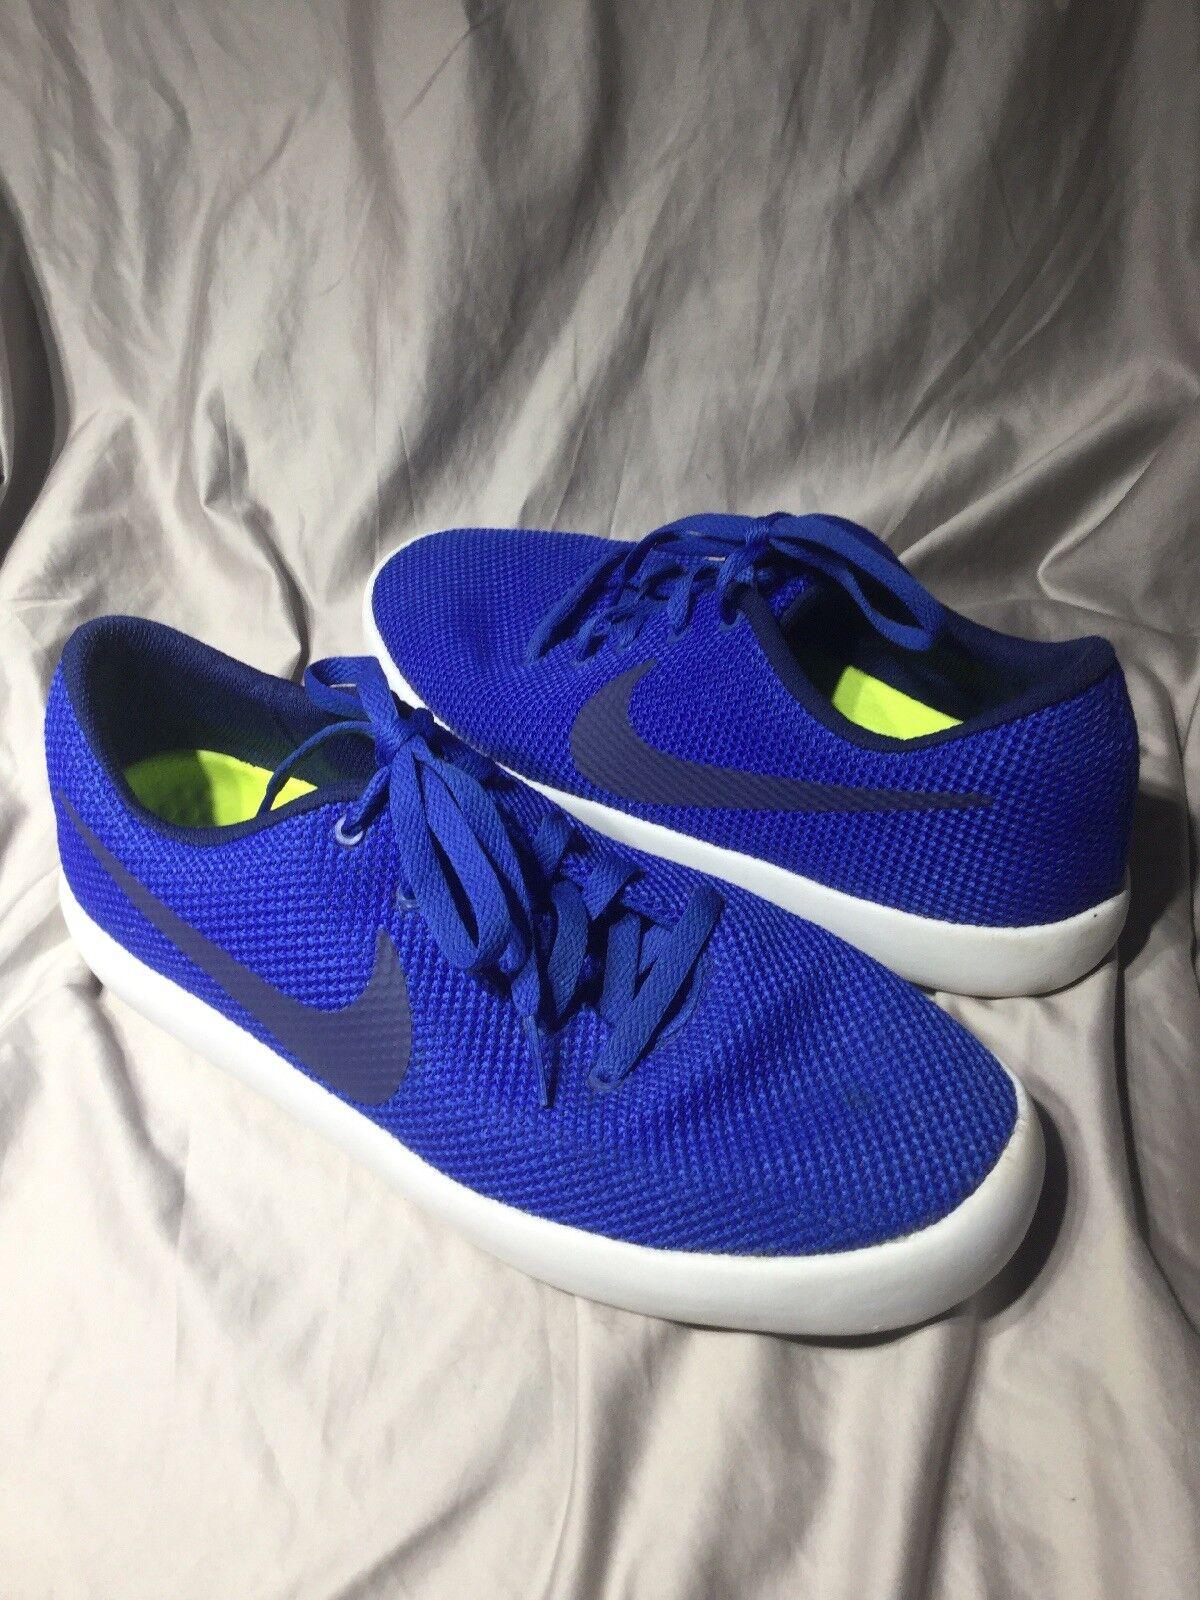 Nike mens 10.5 Essentialist Sneaker shoes sz 10.5 mens blue 819810 441 ae6716